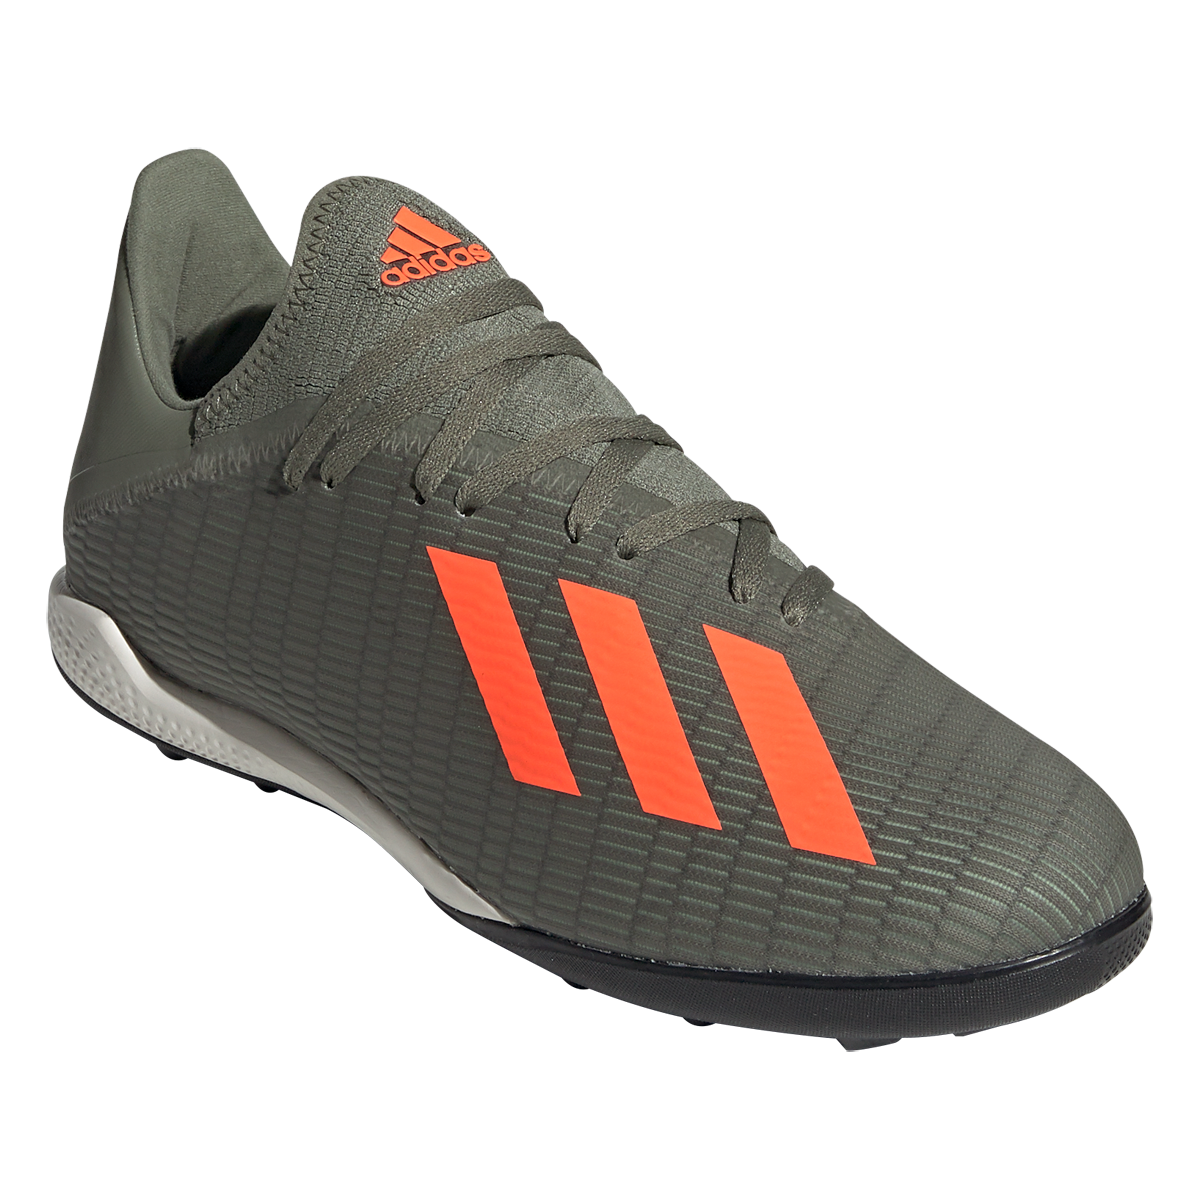 Adidas X 19 3 Tf Artificial Turf Soccer Shoe Legacy Green Solar Orange Chalk White 12 5 Soccer Shoe Indoor Shoe Football Boots